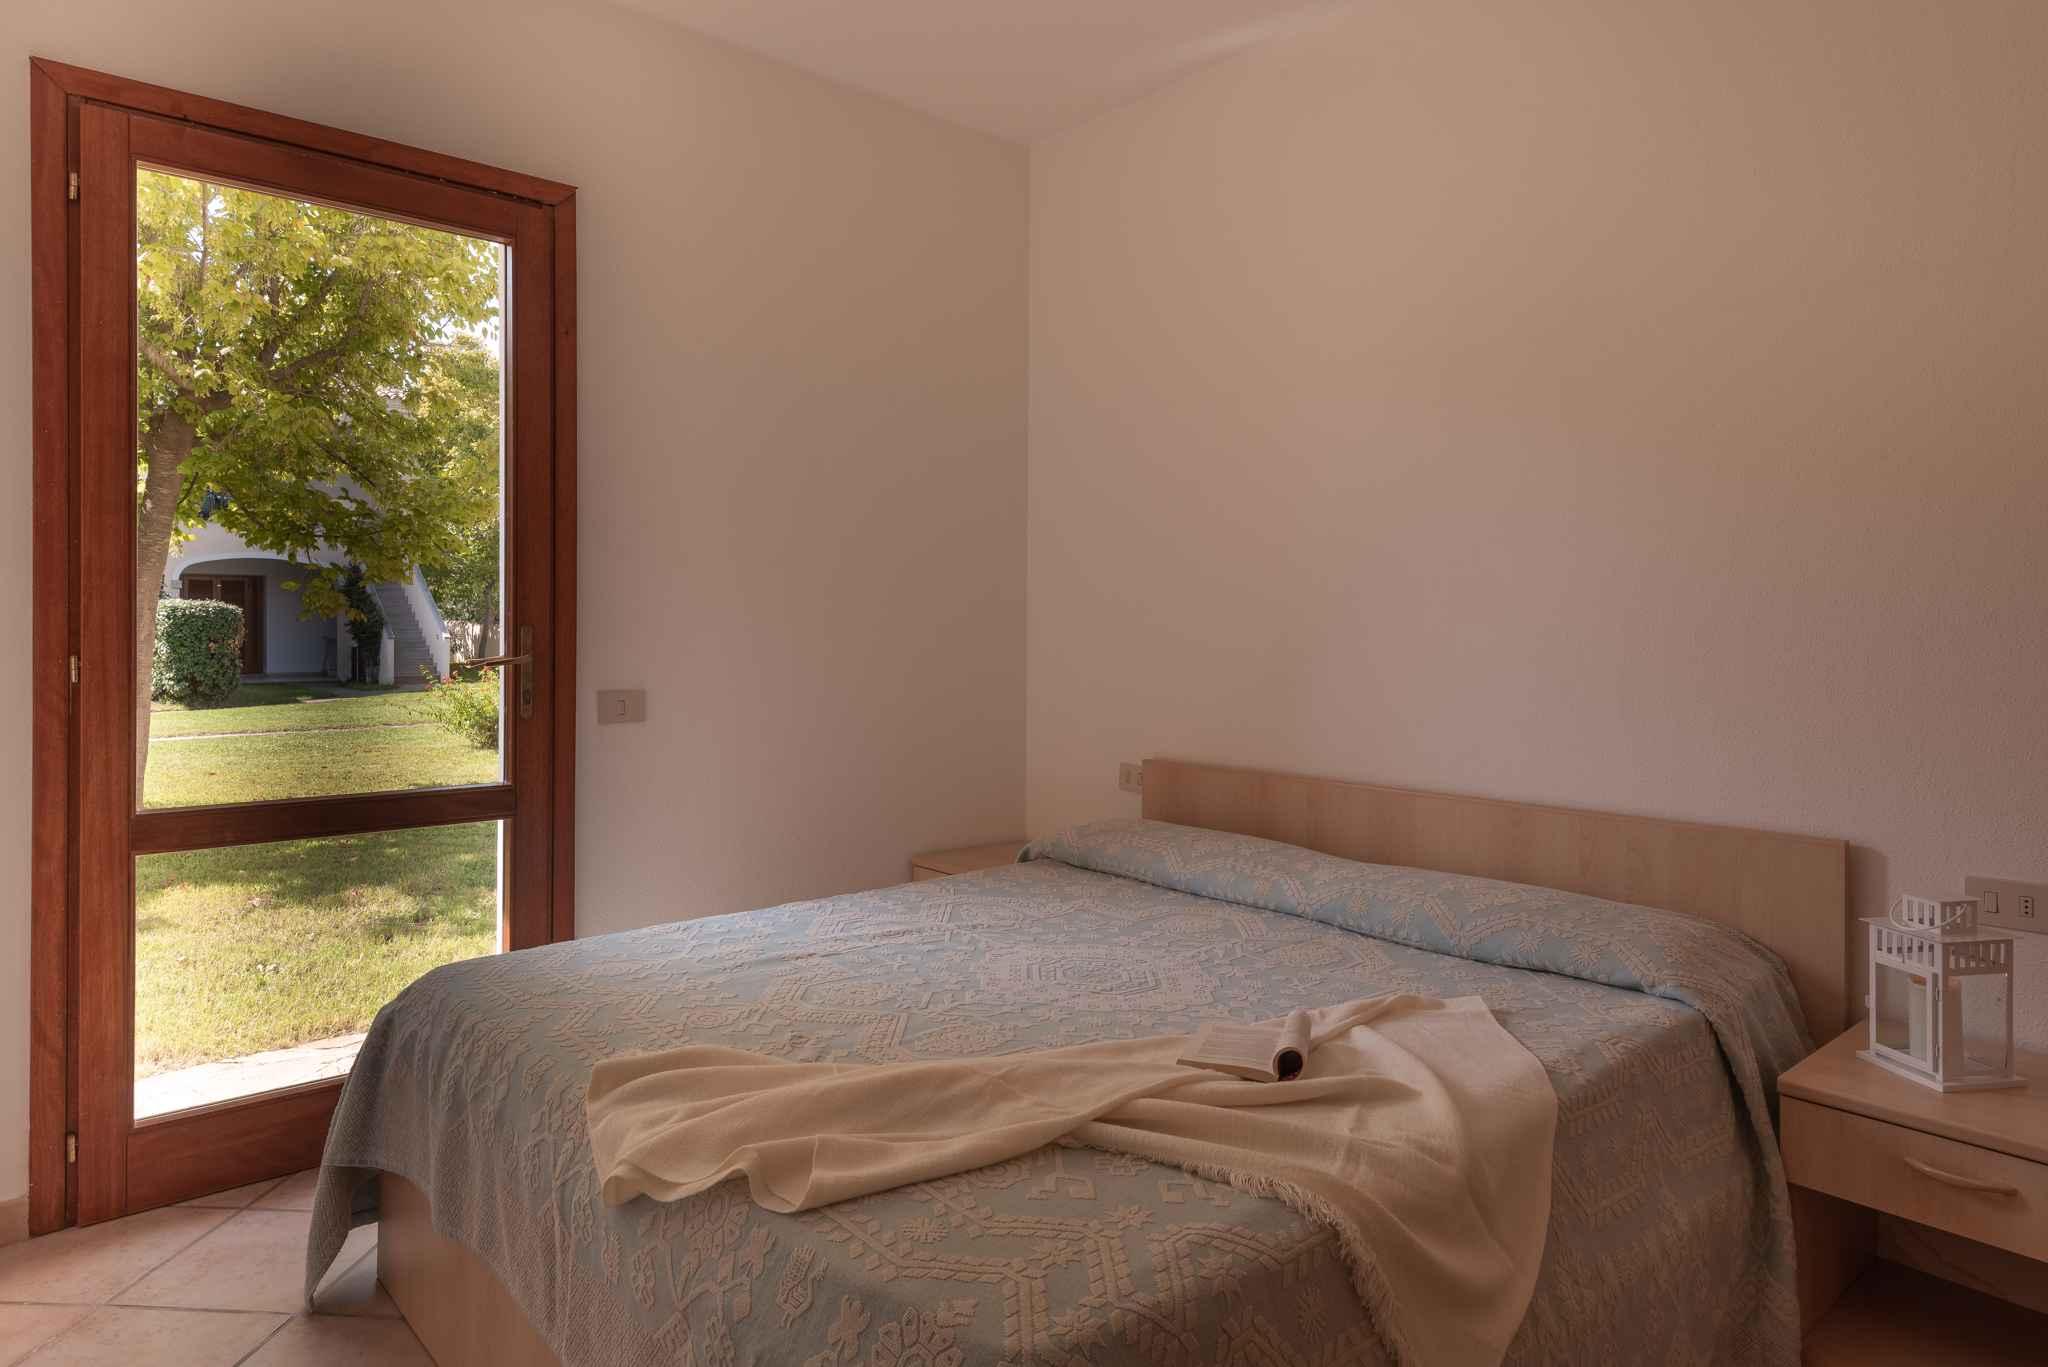 Ferienwohnung Appartamento 4 persone (2853260), Budoni, Olbia-Tempio, Sardinien, Italien, Bild 5